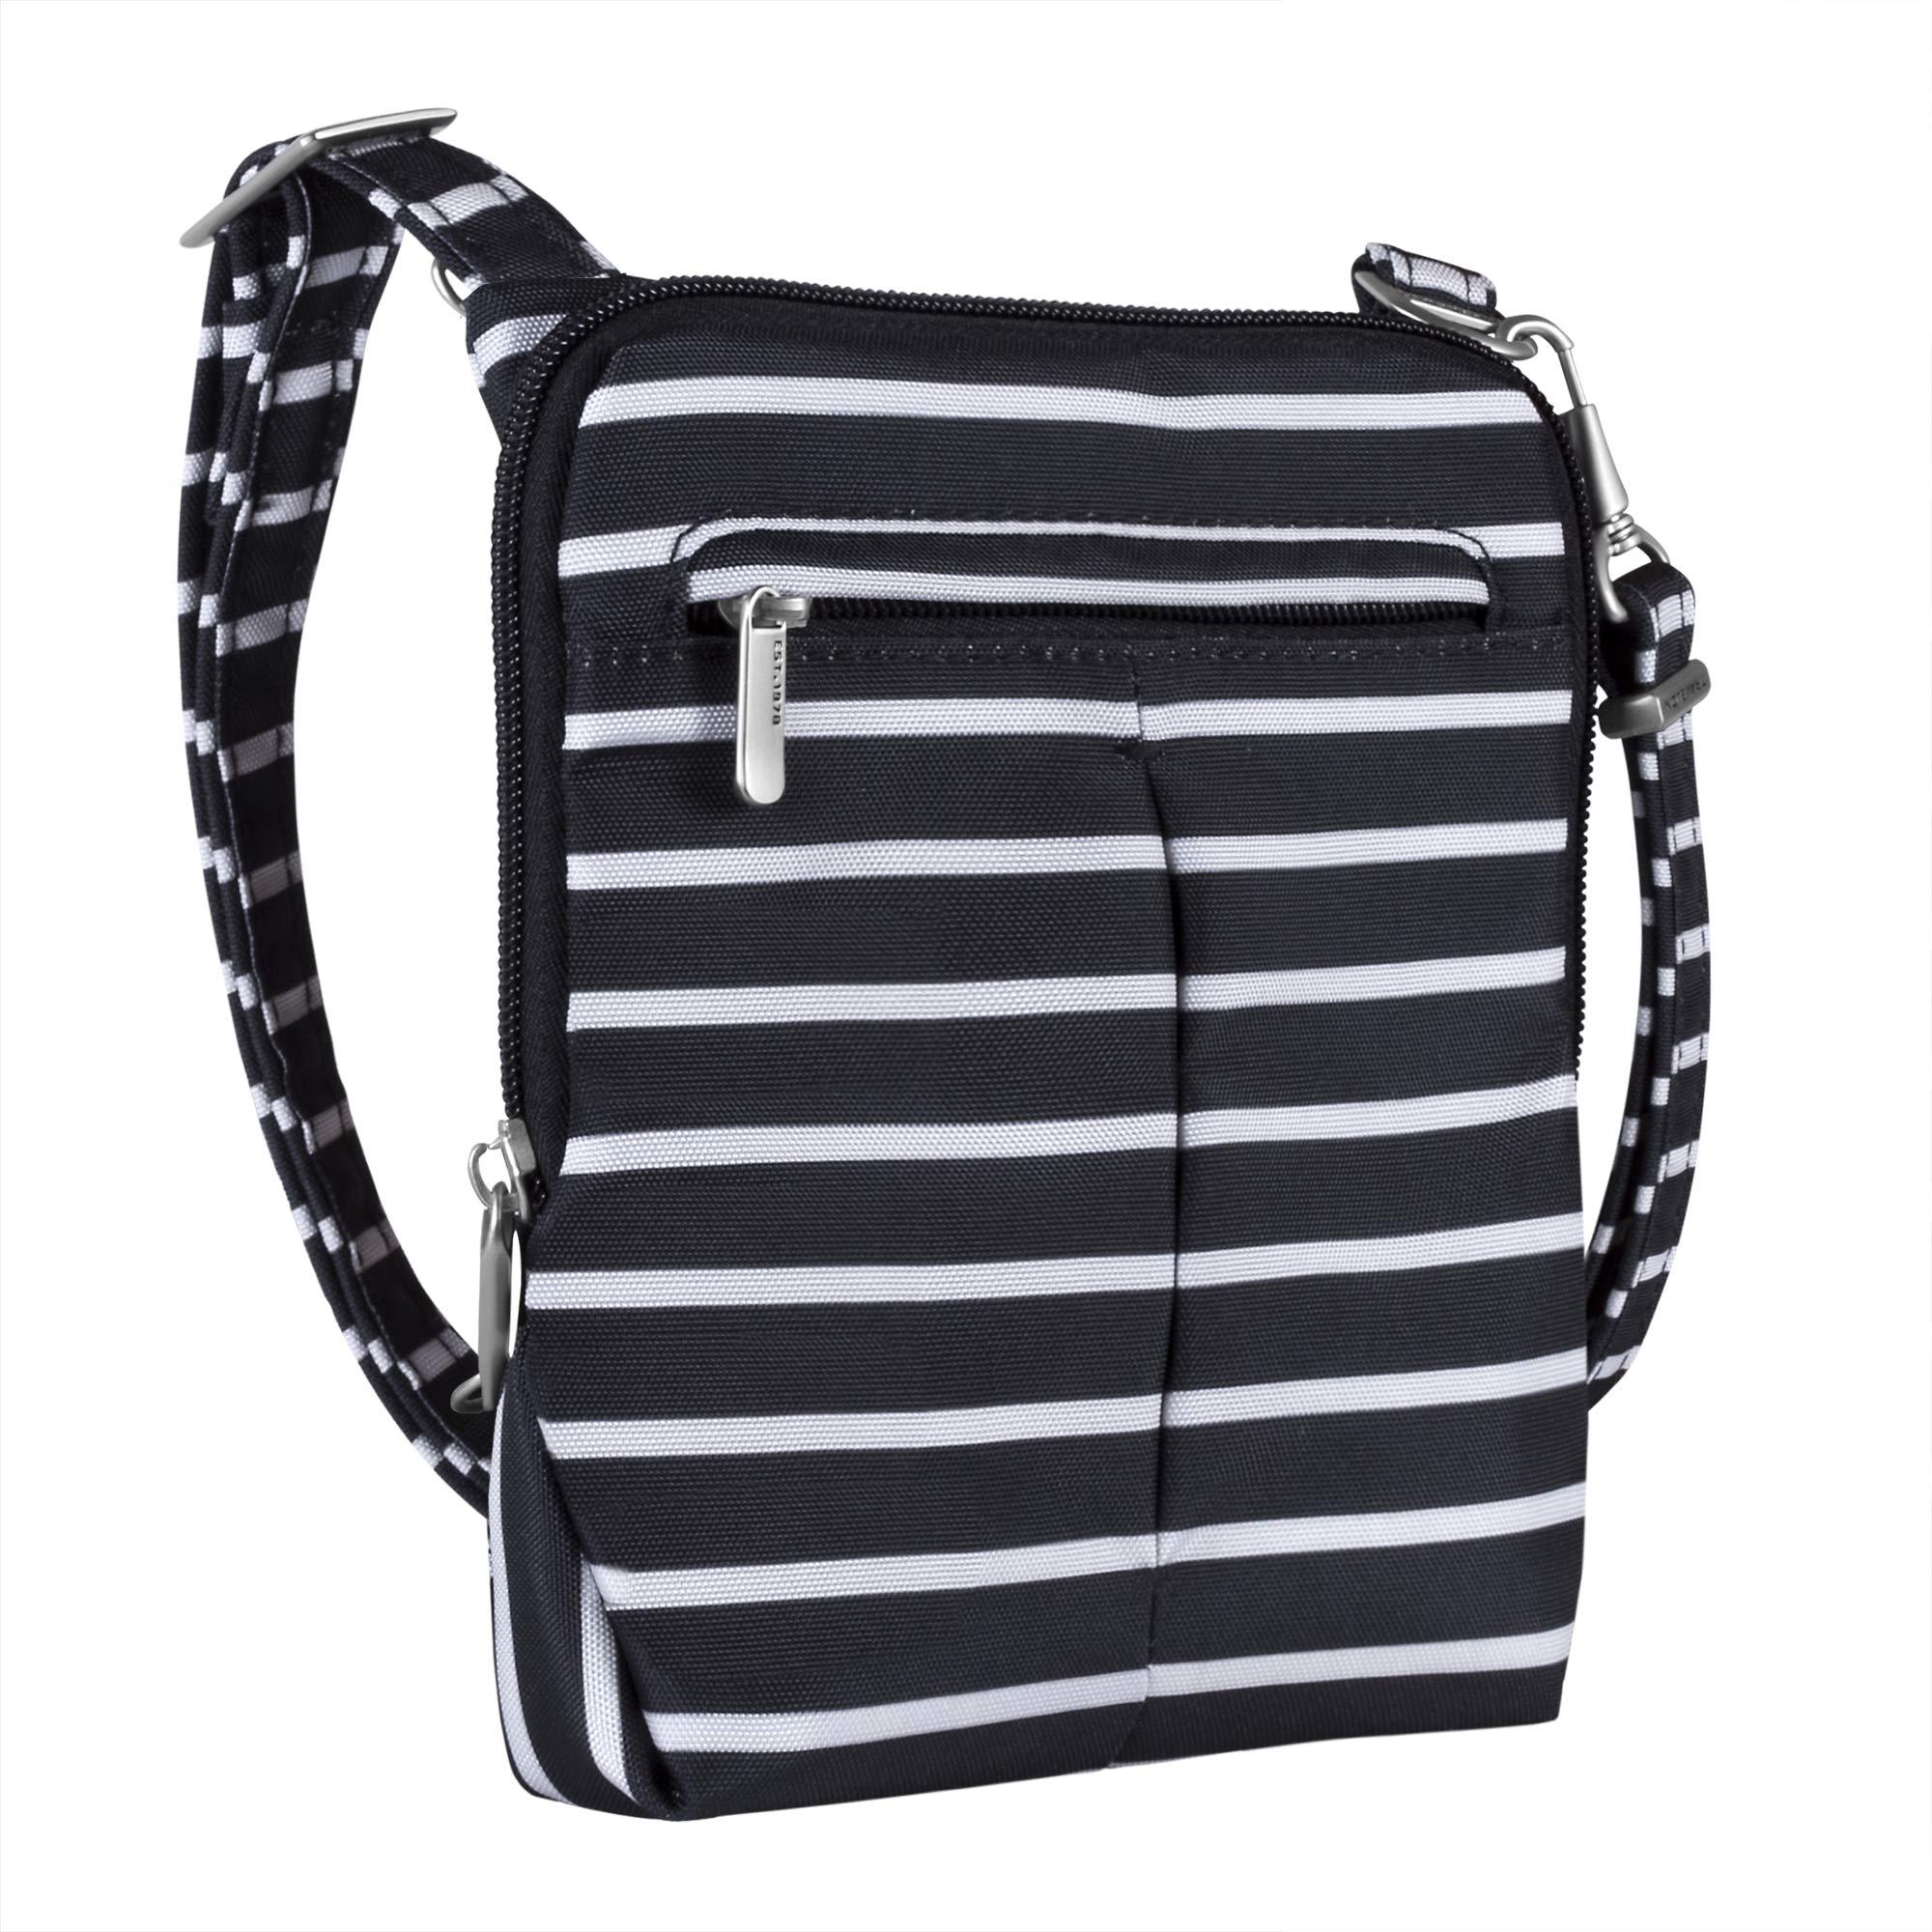 Travelon Anti-Theft Classic Light Mini Crossbody Bag (Black w/White Stripe)